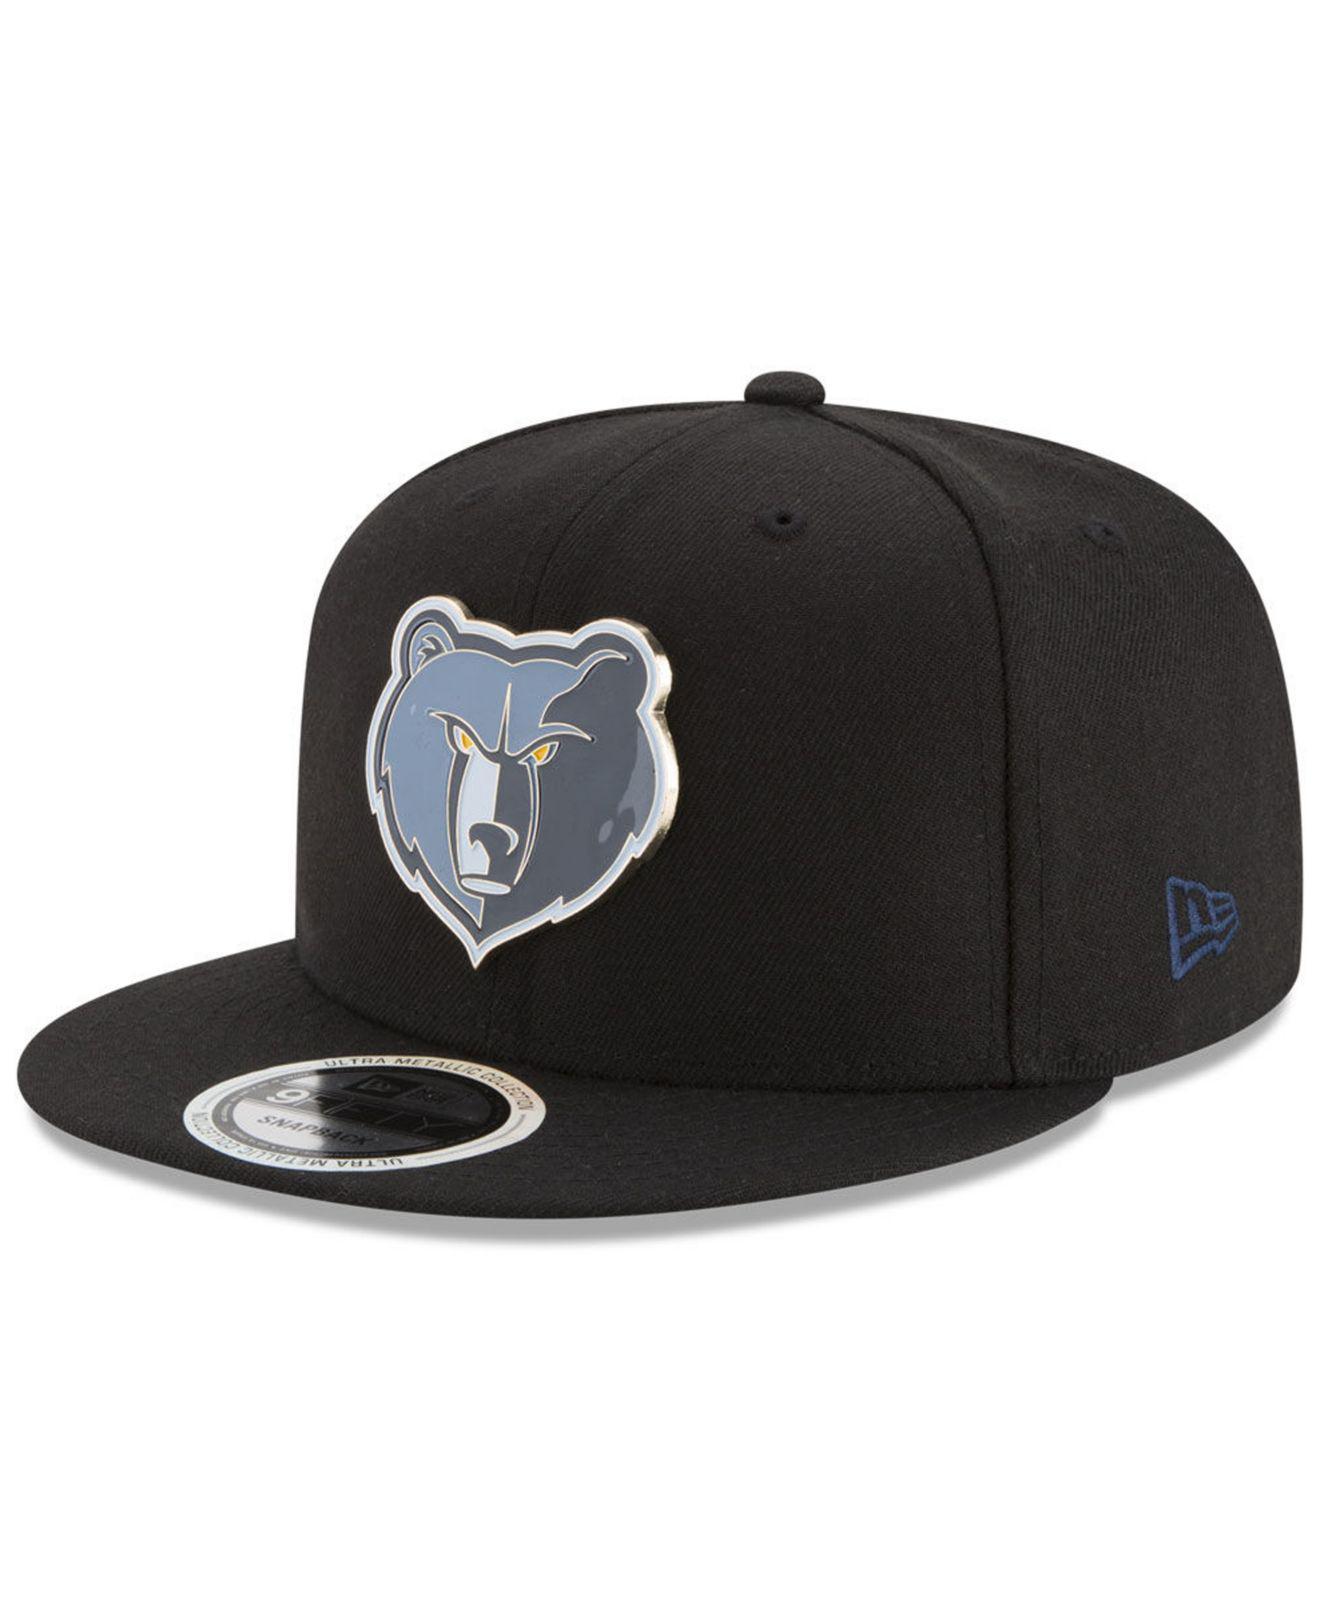 wholesale dealer fa2f2 01988 Lyst - KTZ Memphis Grizzlies Enamel Badge 9fifty Snapback Cap in ...